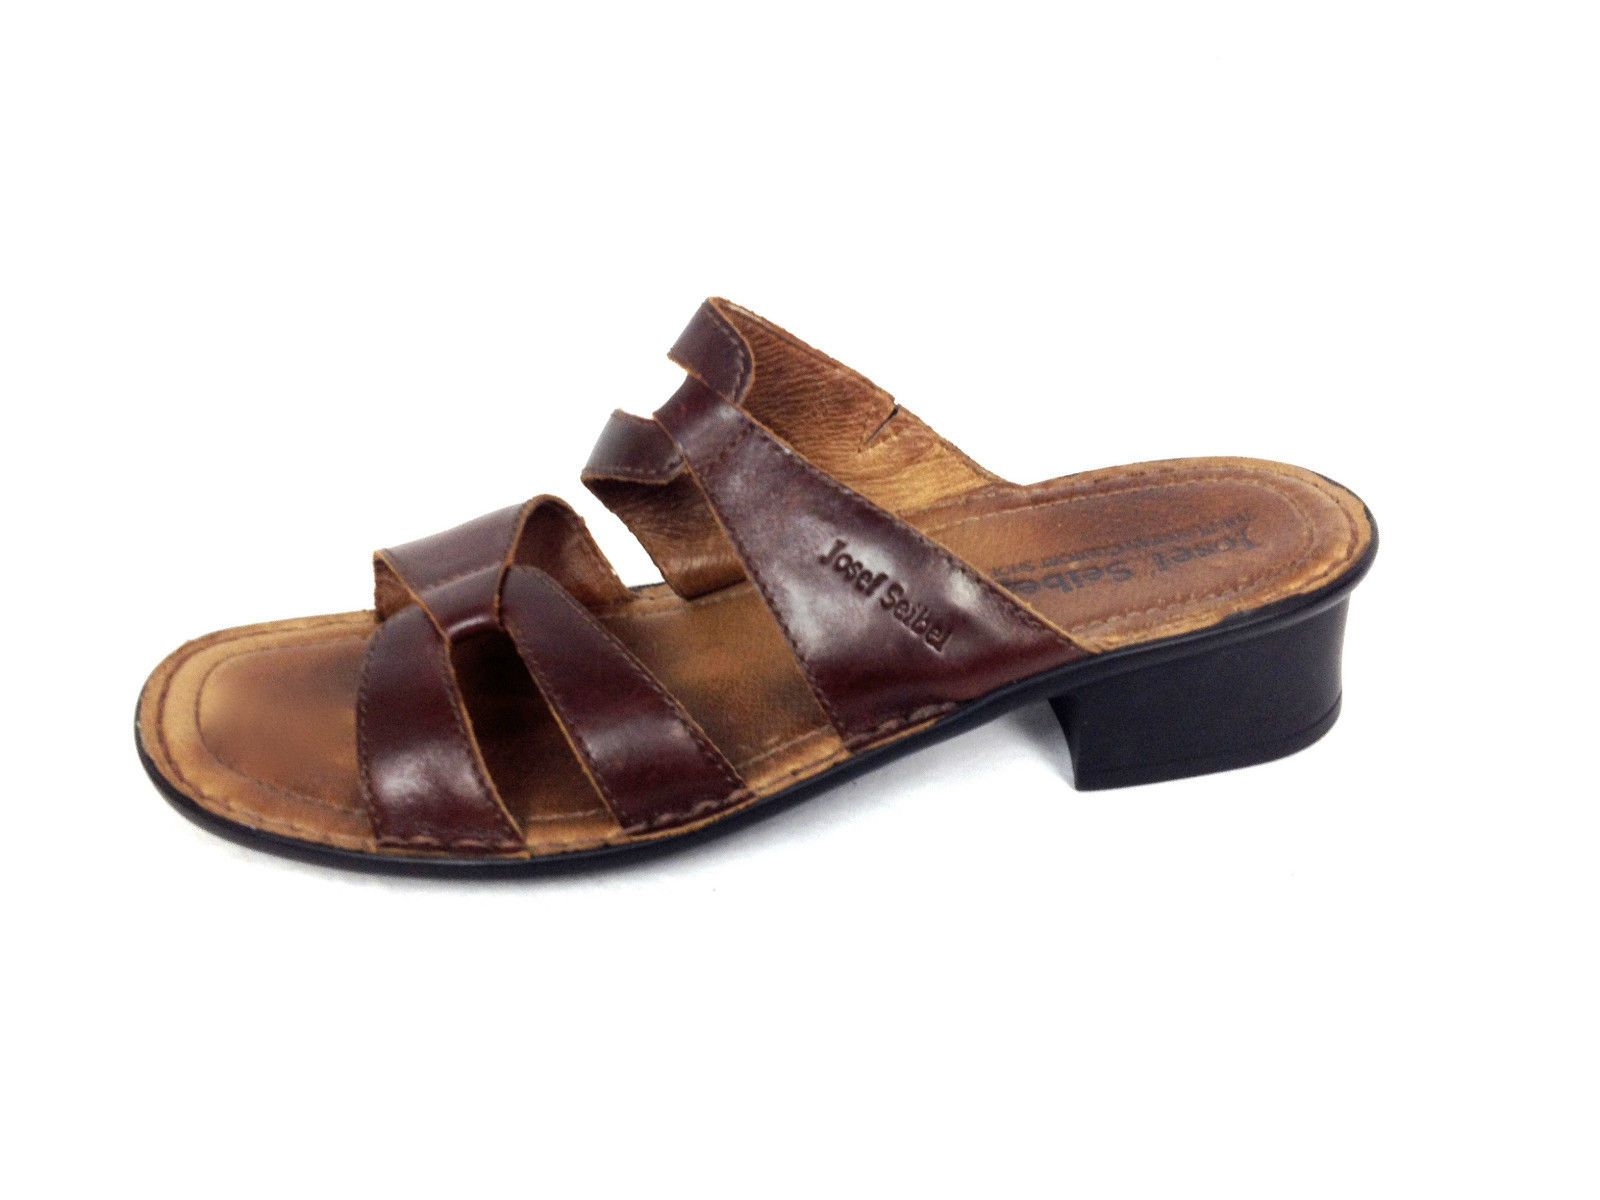 Shoes Like Pottery Women S